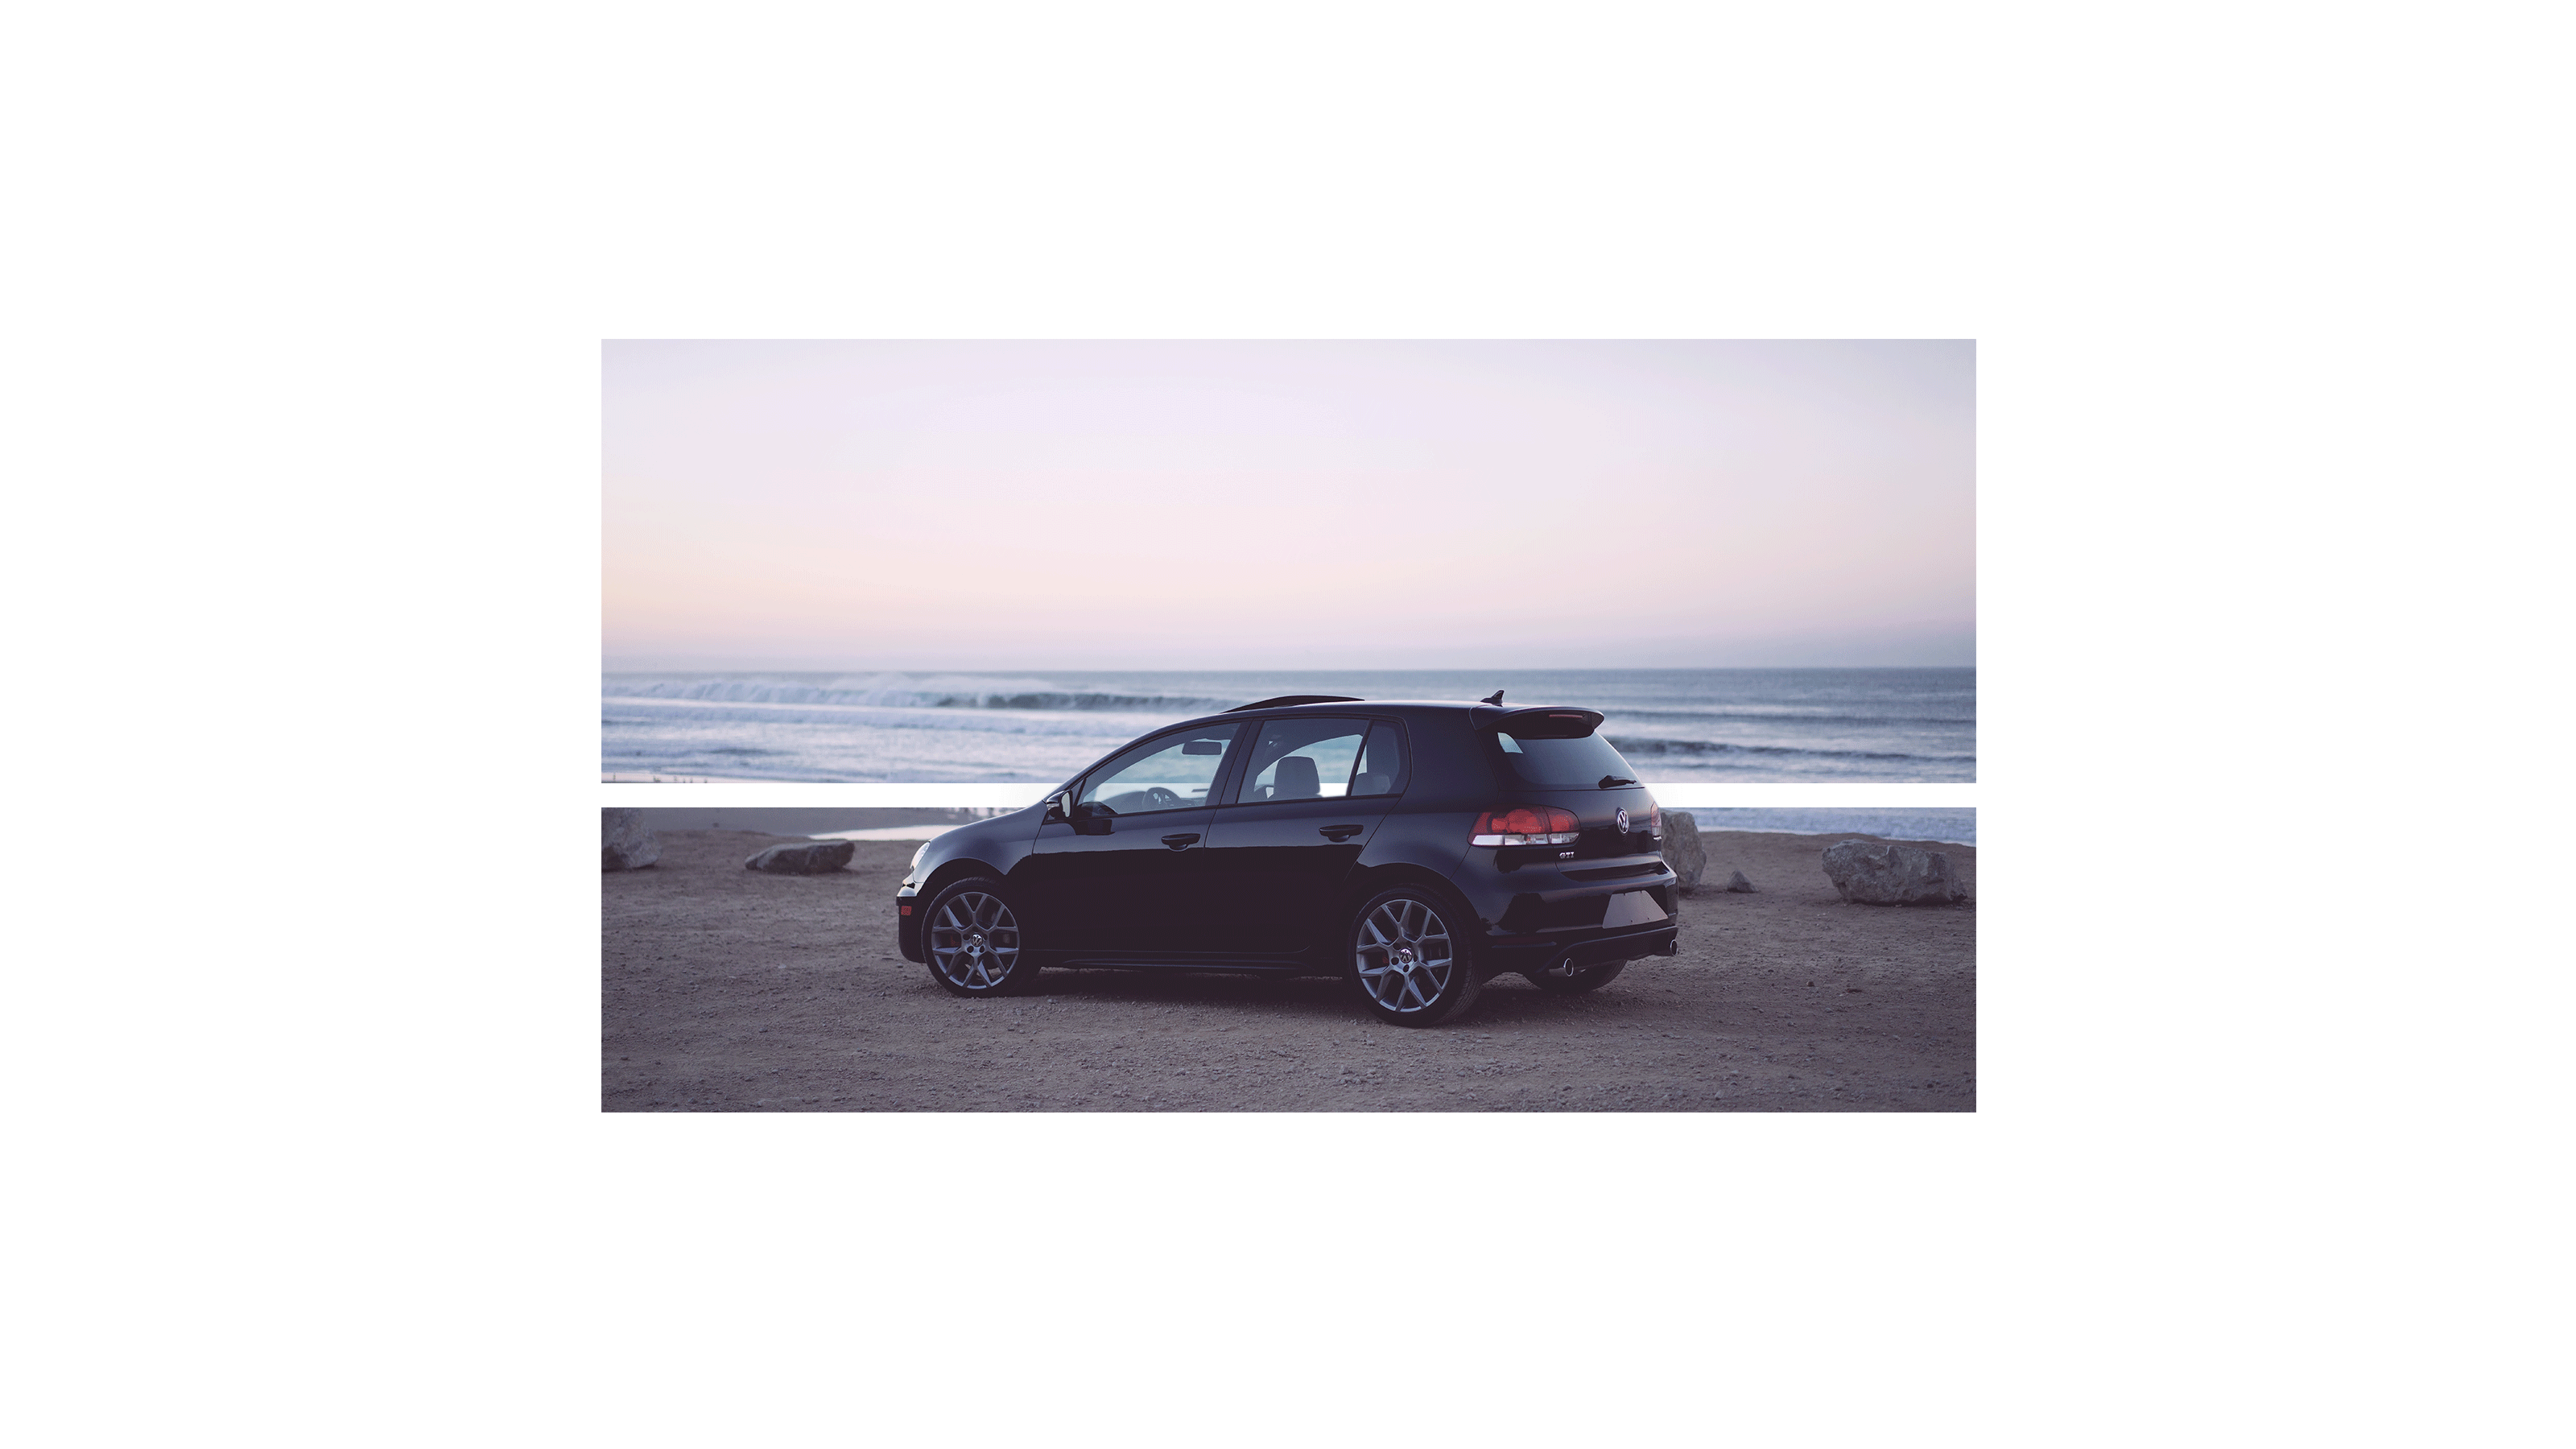 spaceit-car1